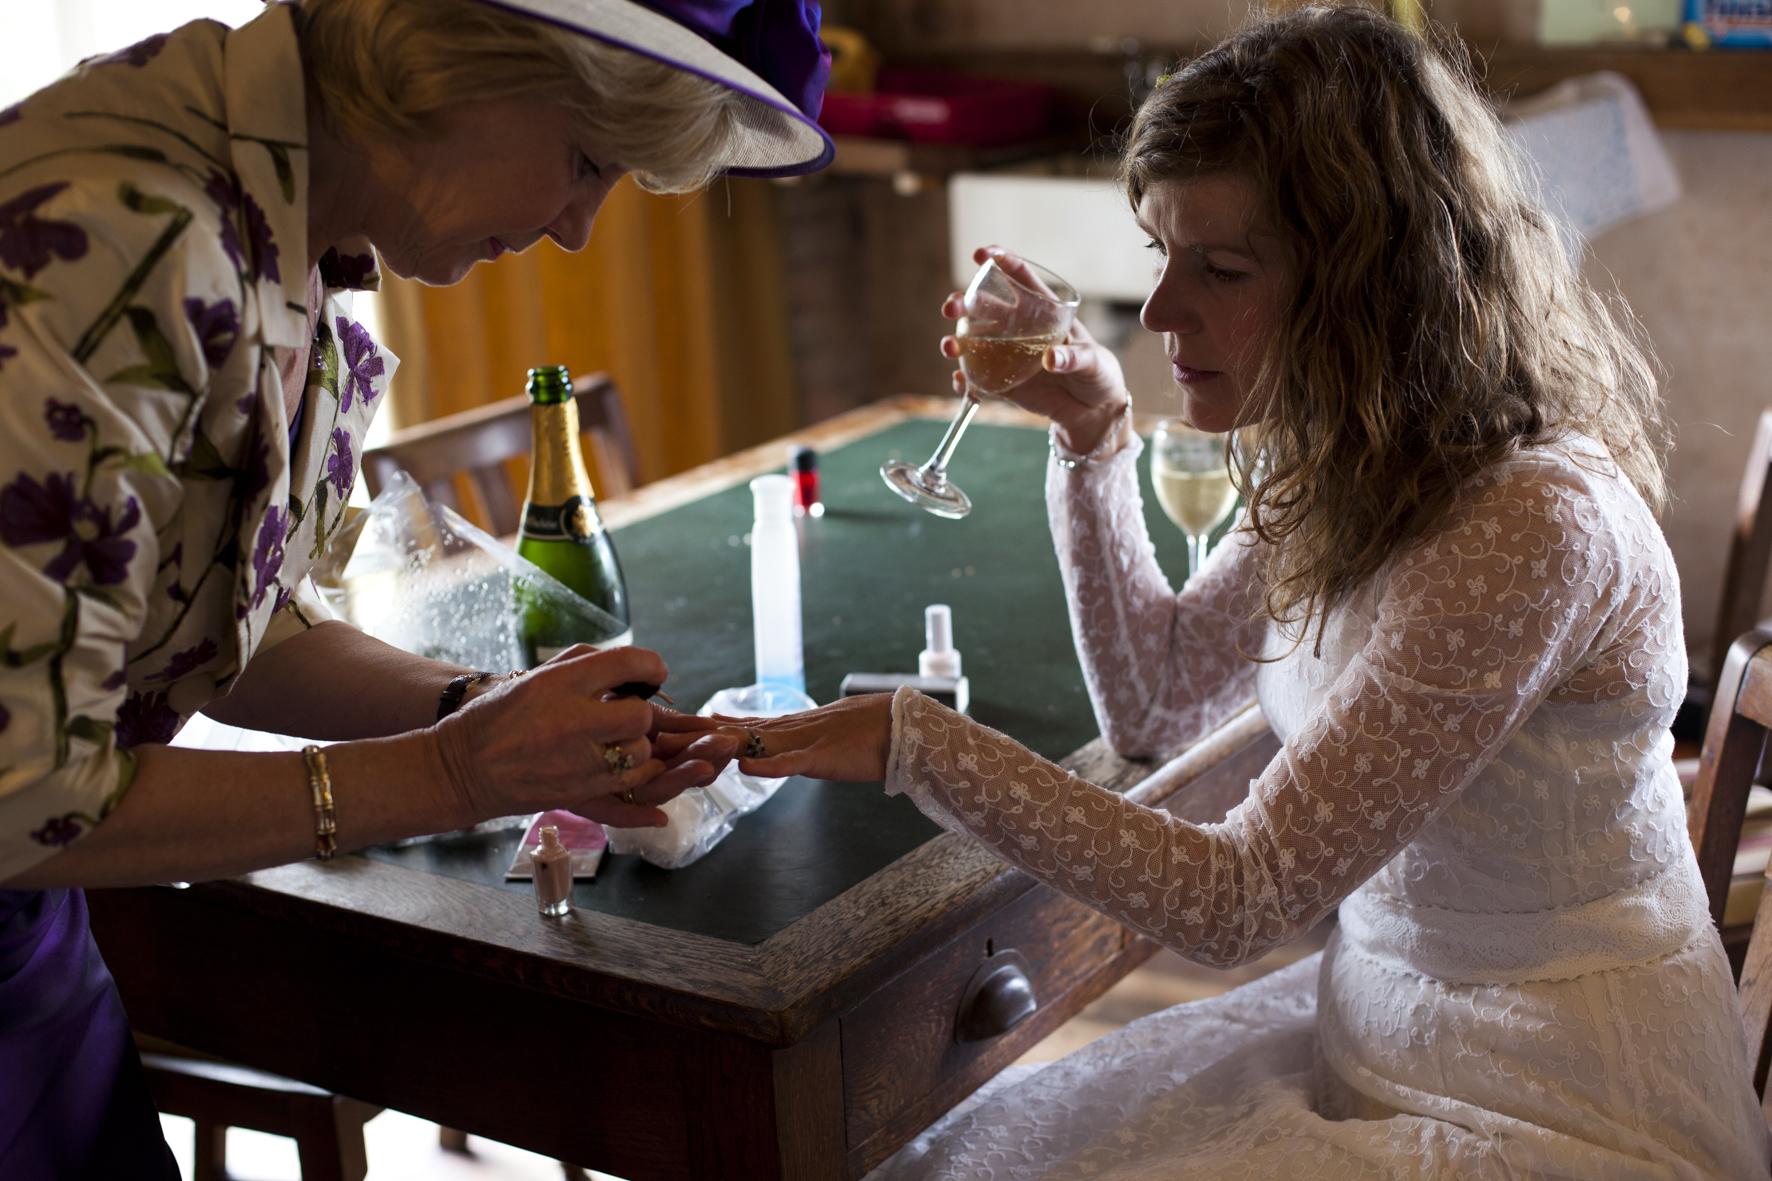 Wedding example_M&P__MG_3218_Claudia Leisinger.jpg